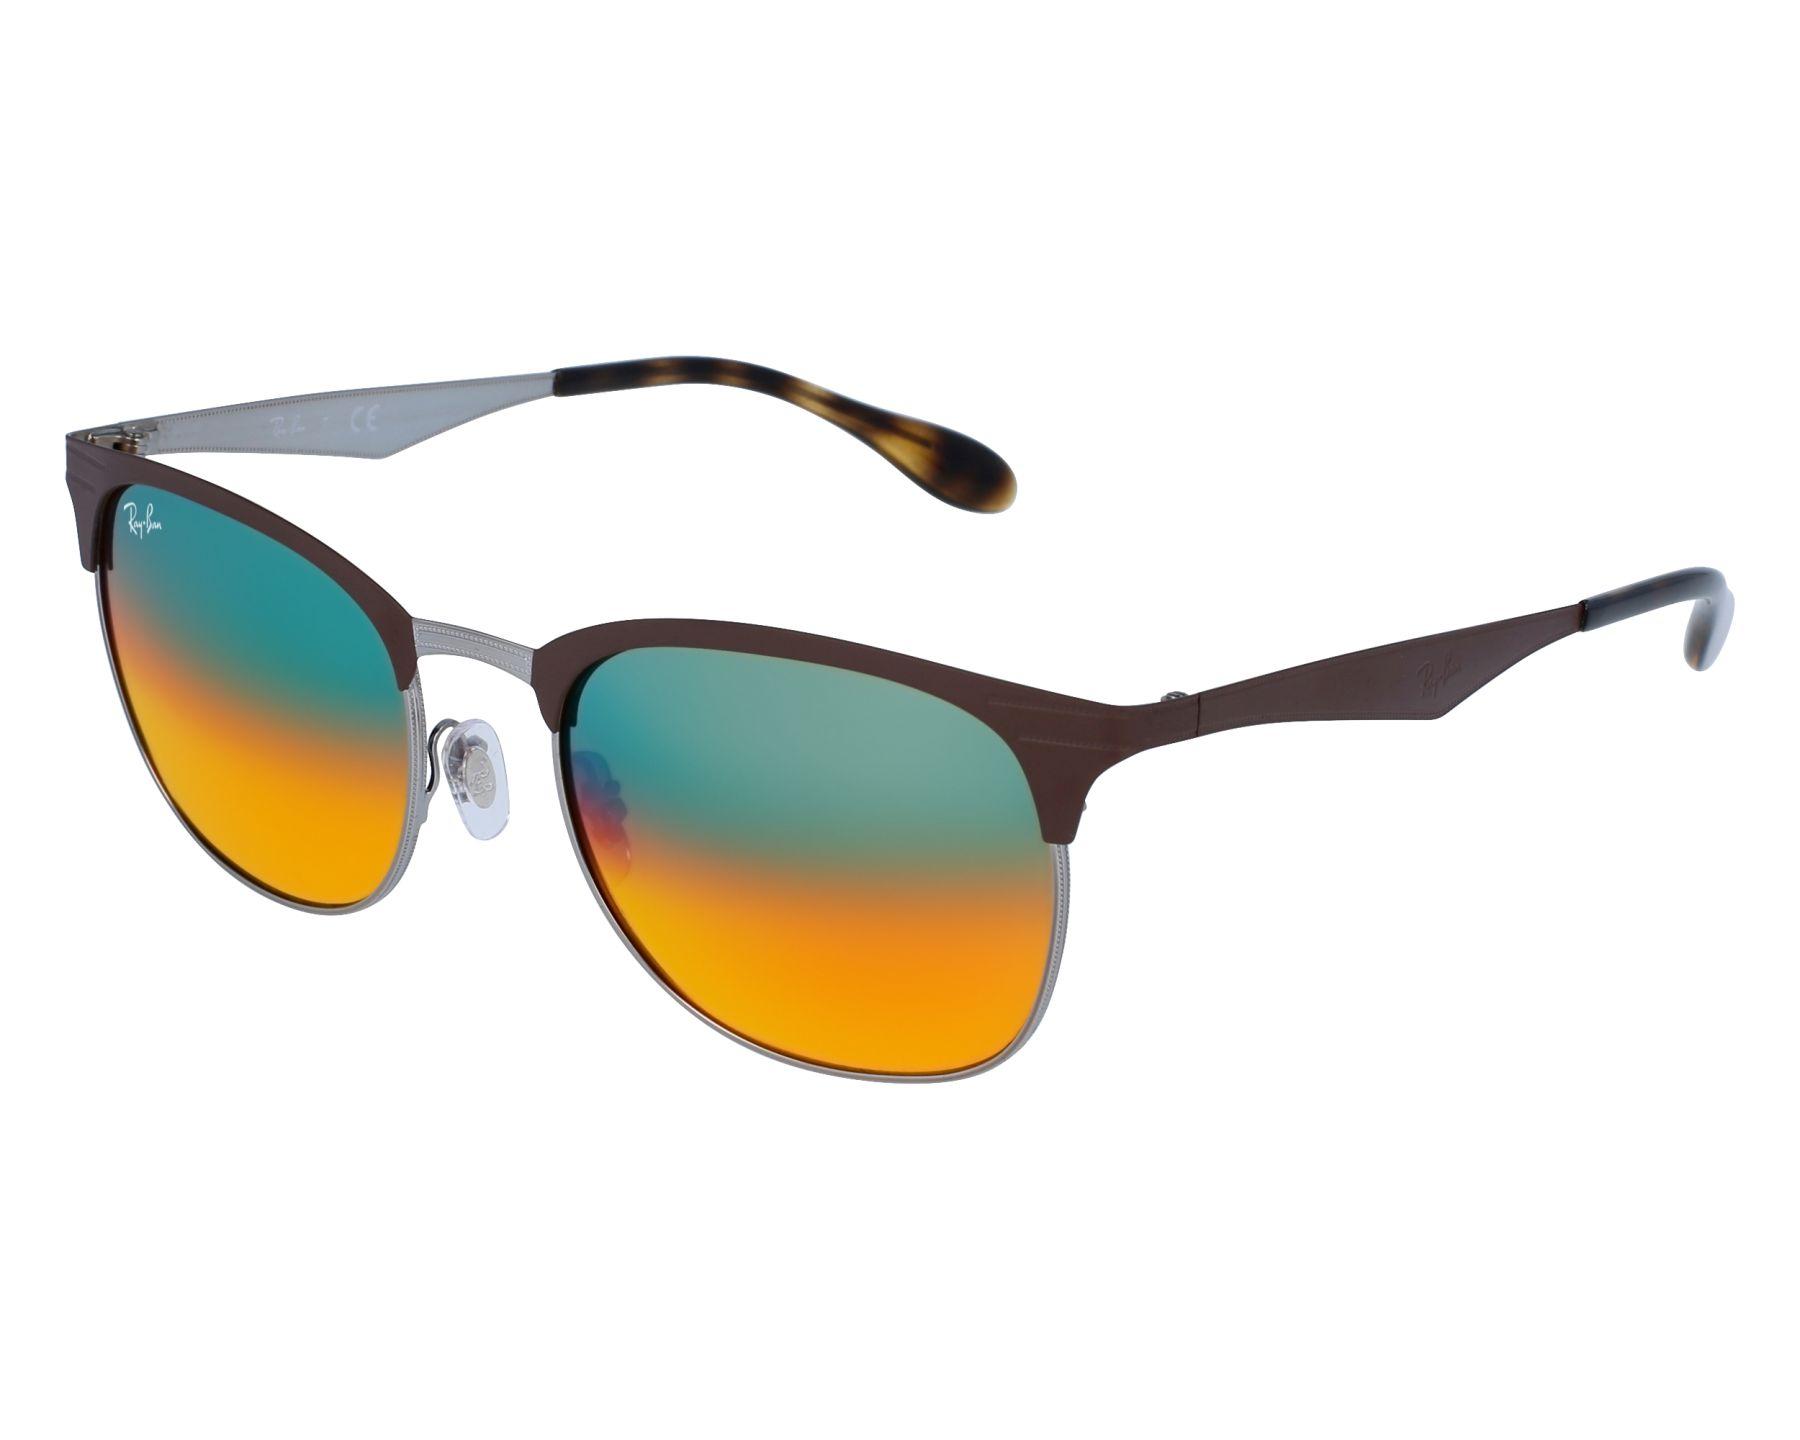 368531e5e91 Sunglasses Ray-Ban RB-3538 9006 A8 53-19 Brown Silver front